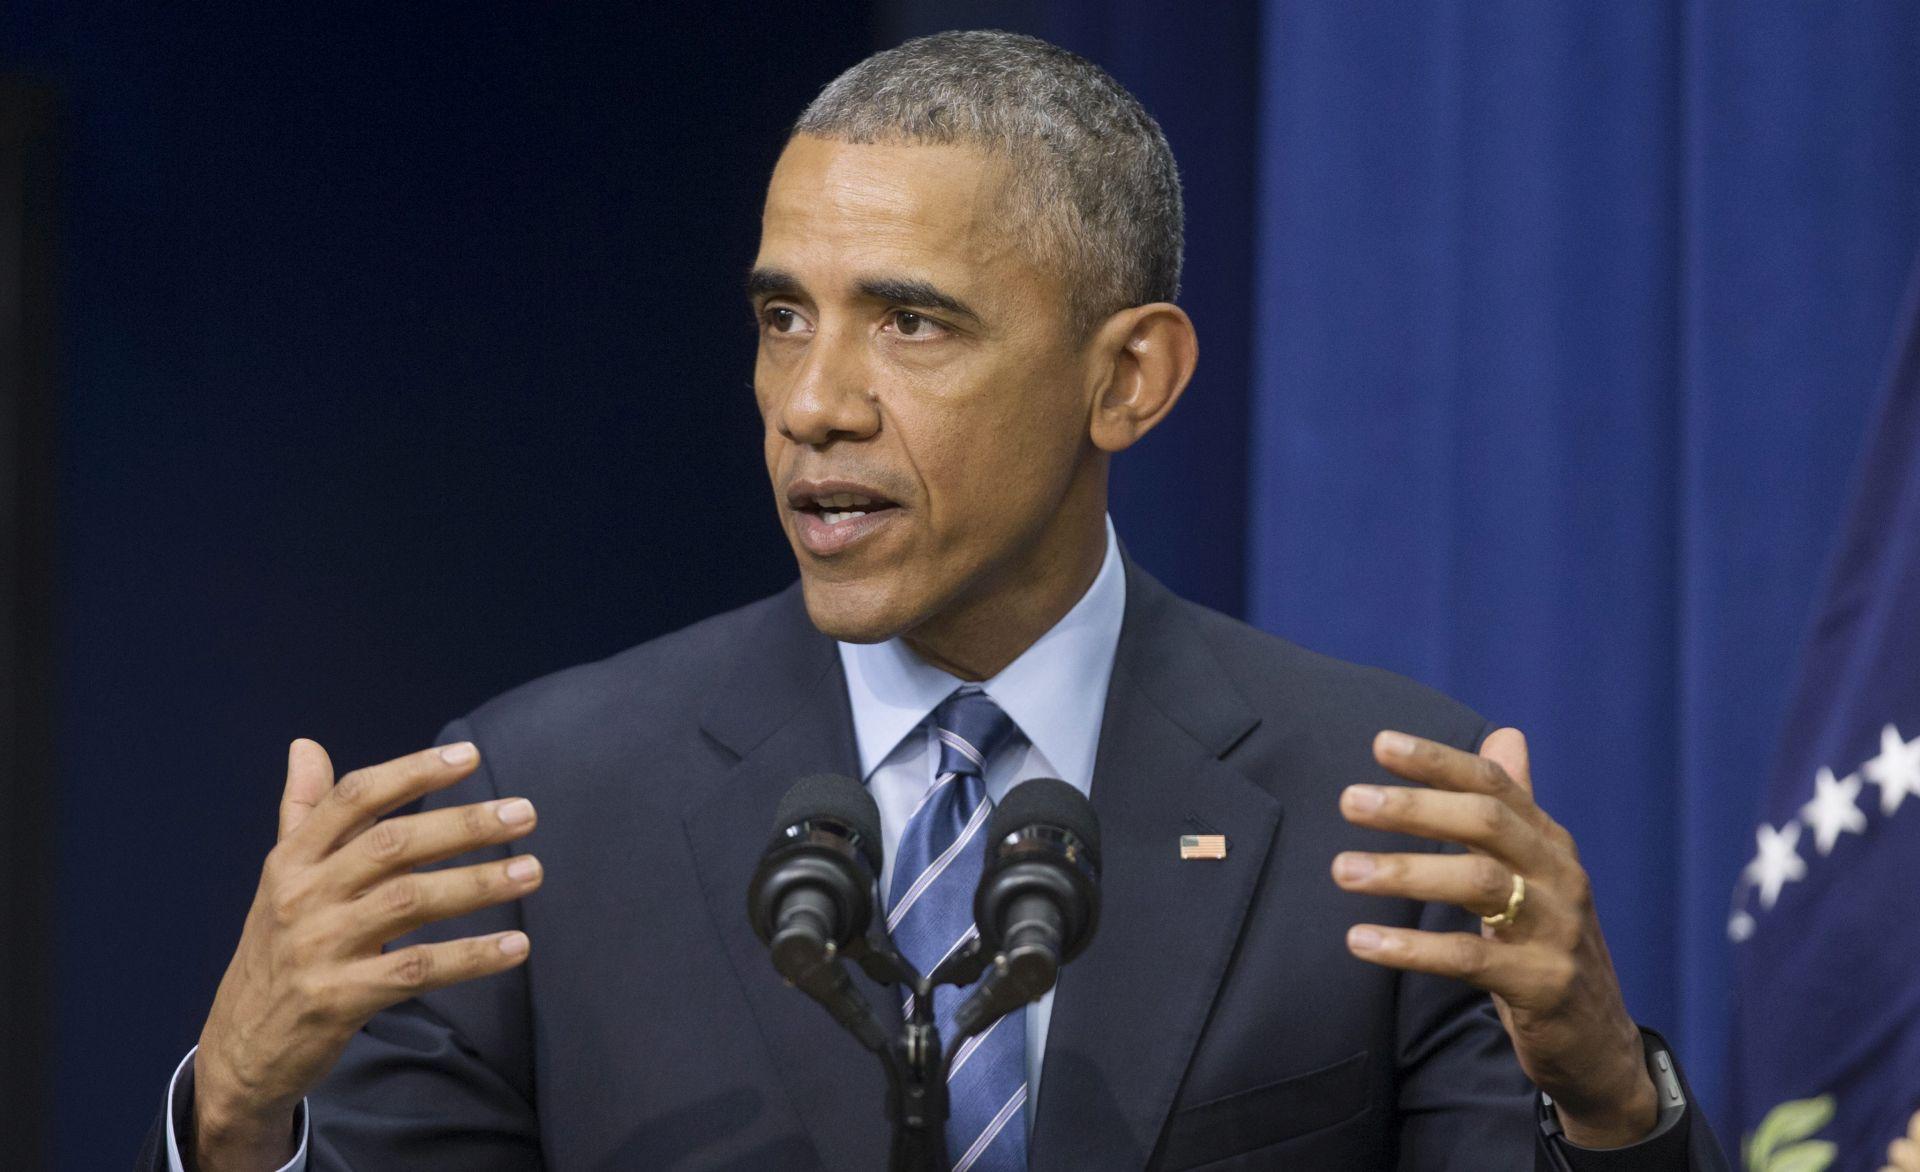 Obama pozvao Vučića na summit o borbi protiv terorizma